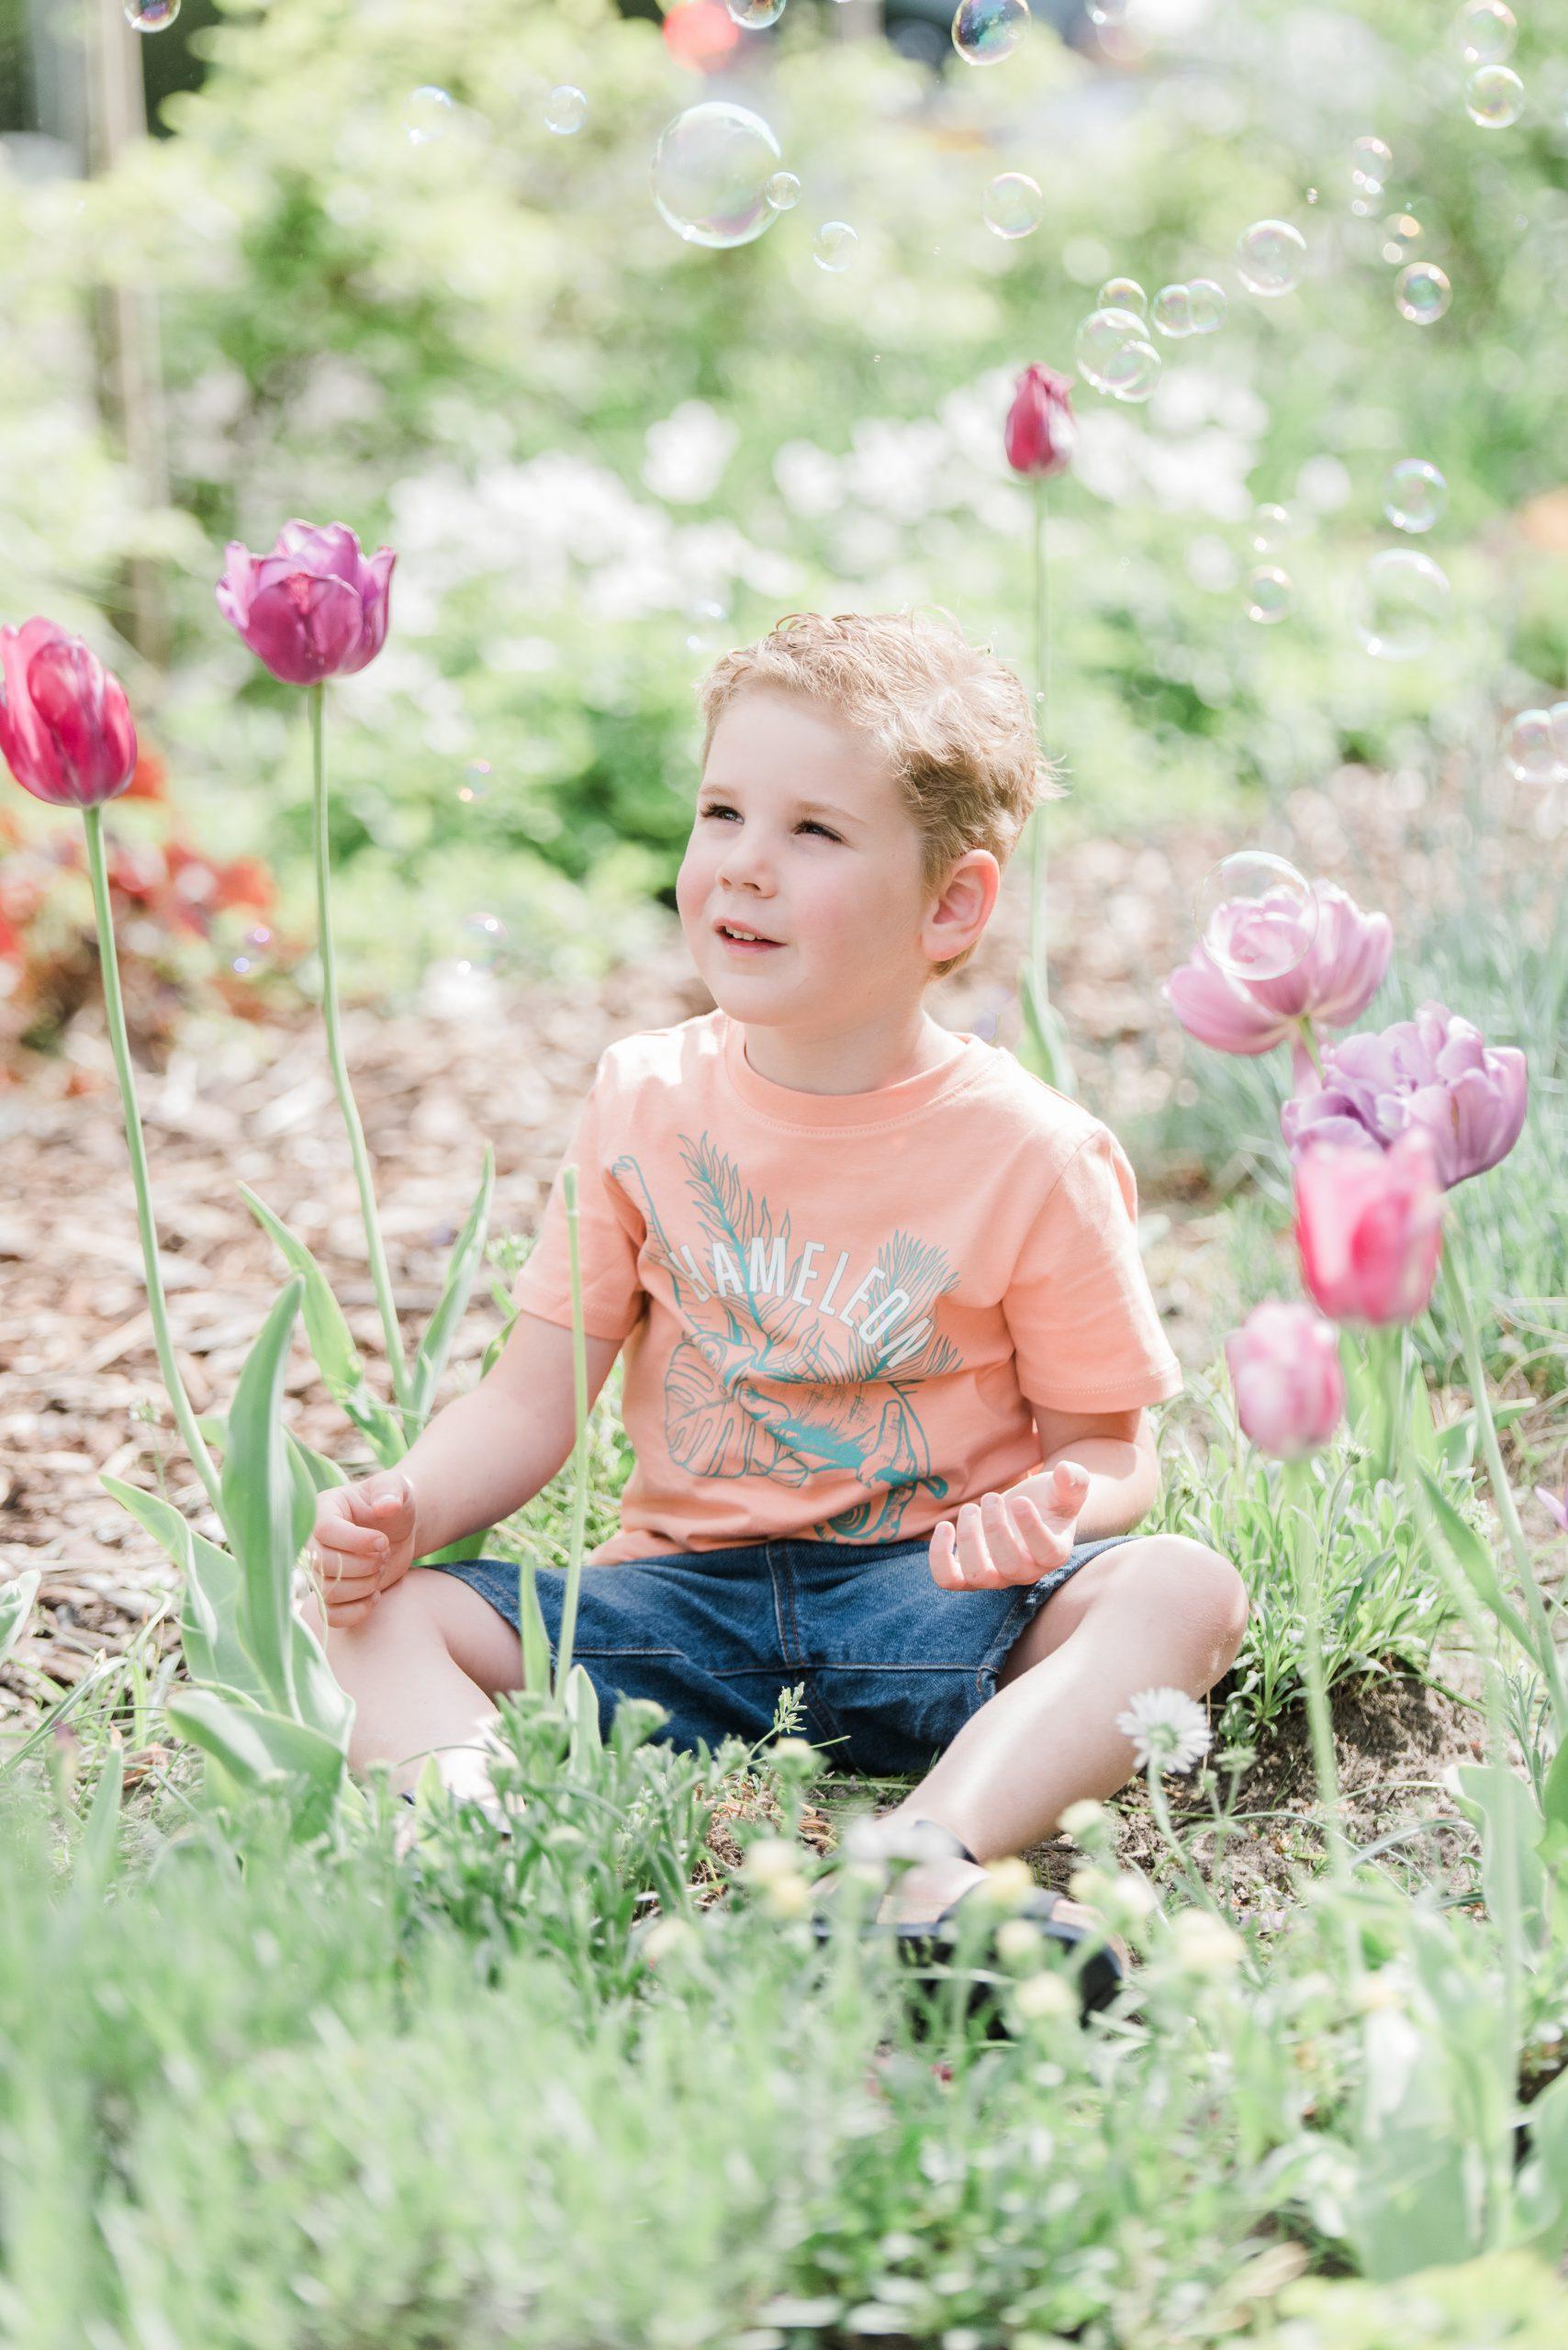 Chantal-Nijhof-Studio-Fotografie-Familiefotoshoot-Kinder-fotoshoot-Kids-fotosessie-5-scaled